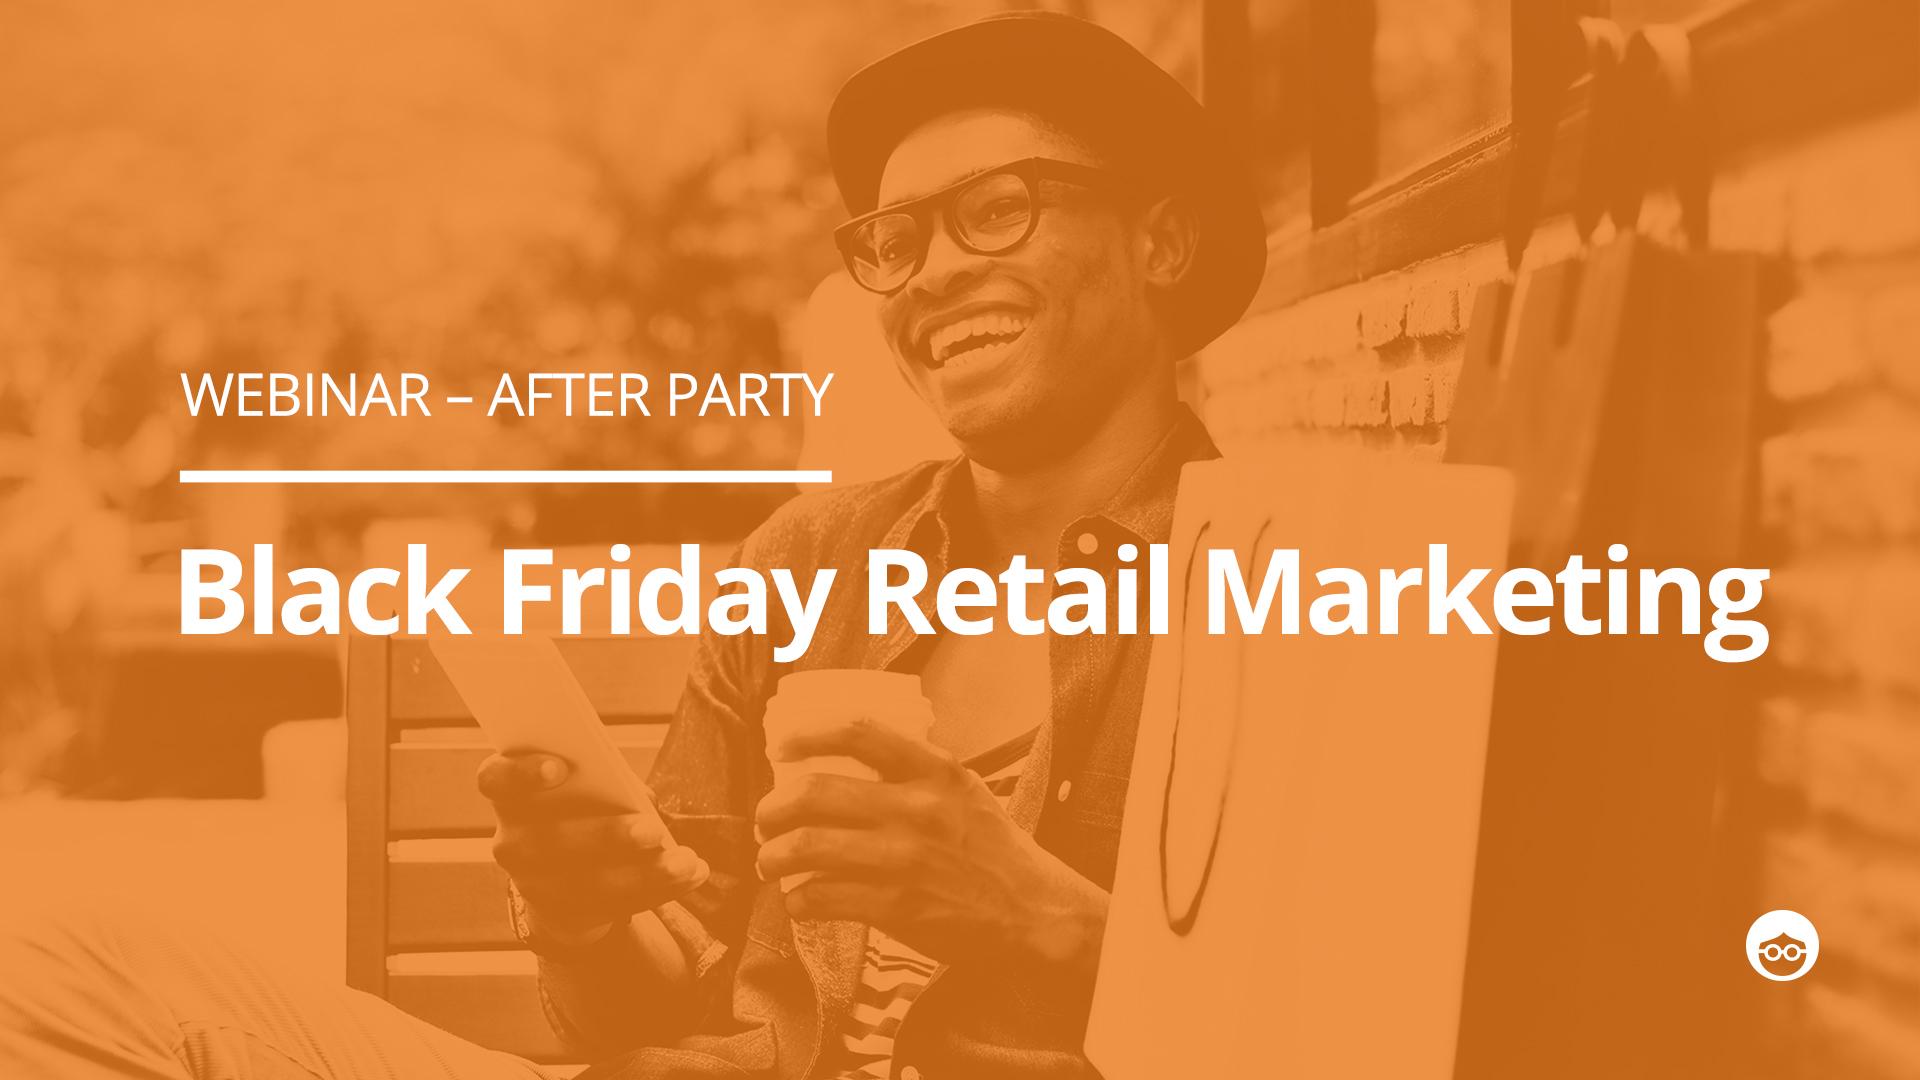 [Webinar Recap] Black Friday Ecommerce Digital Strategies: How to Turn Traffic into Sales